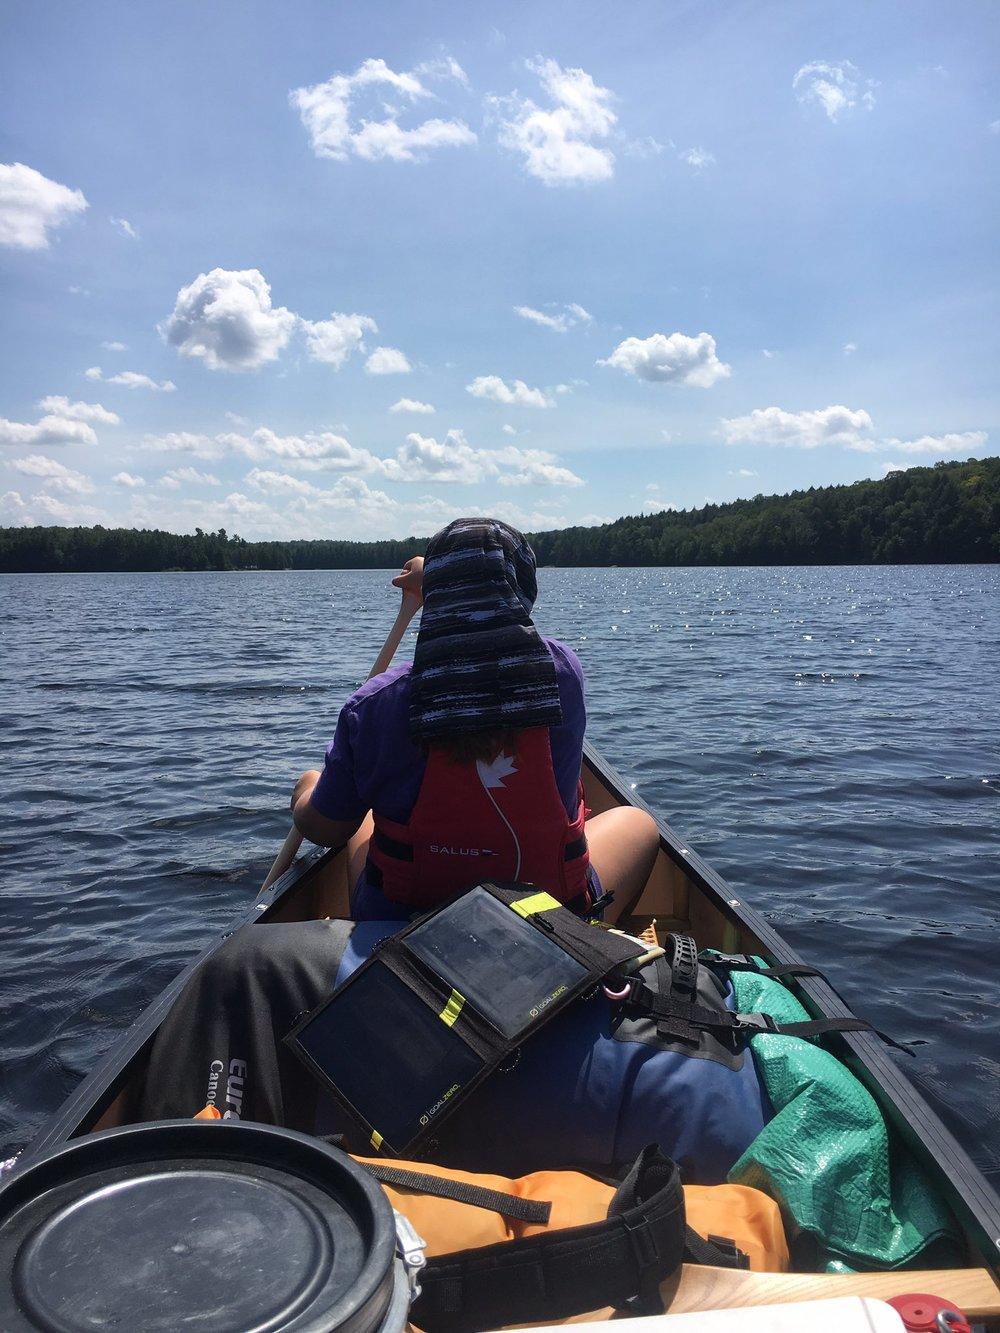 Sarah DiGregorio - Bottle Lake, Kawartha Highlands Signature Site, Ontario